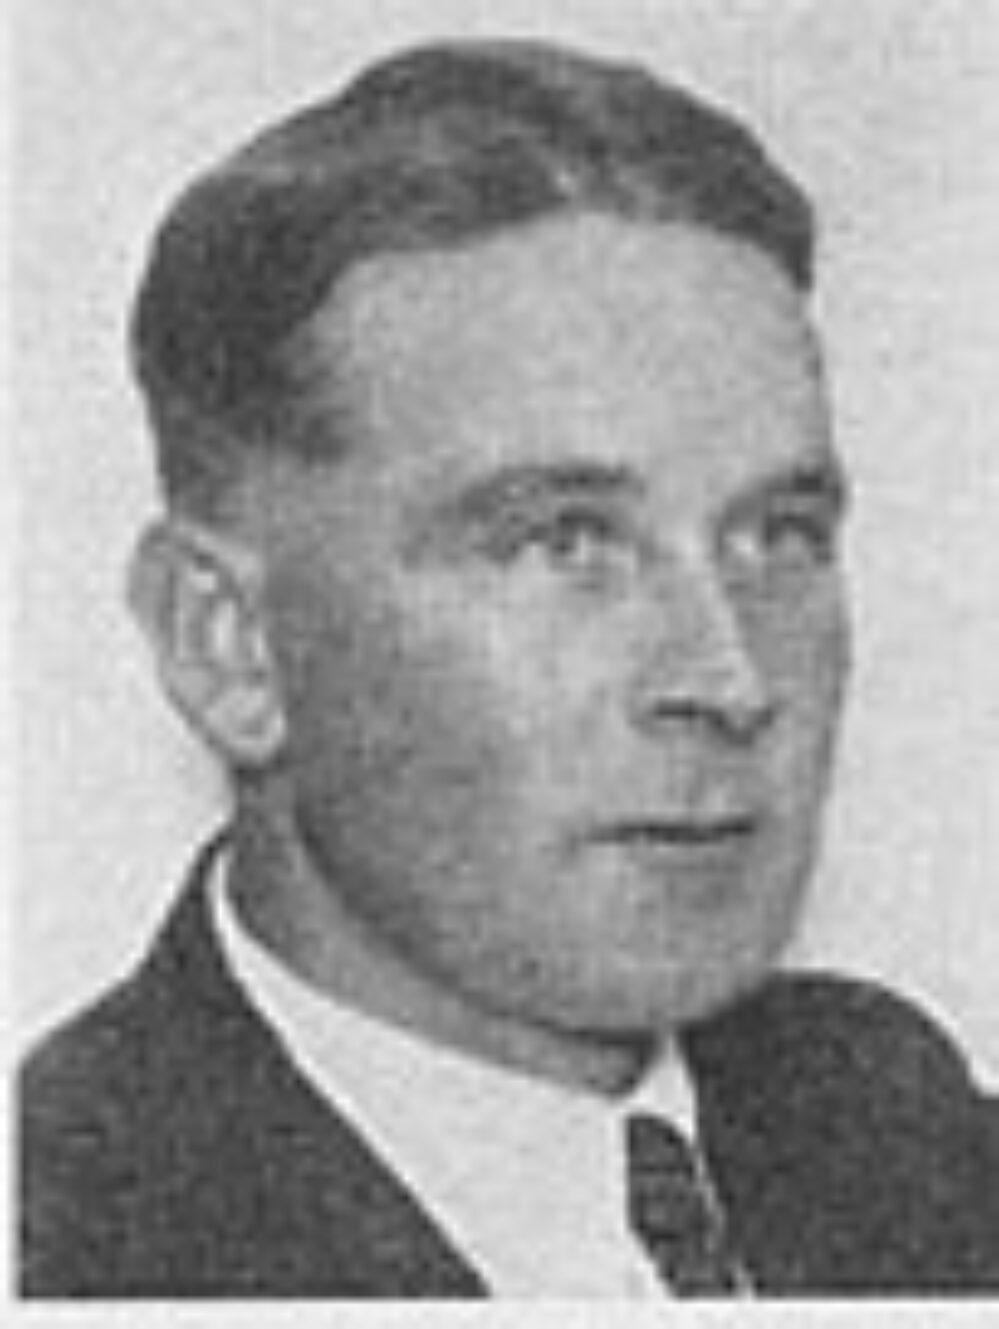 Knut Gisle Knudsen